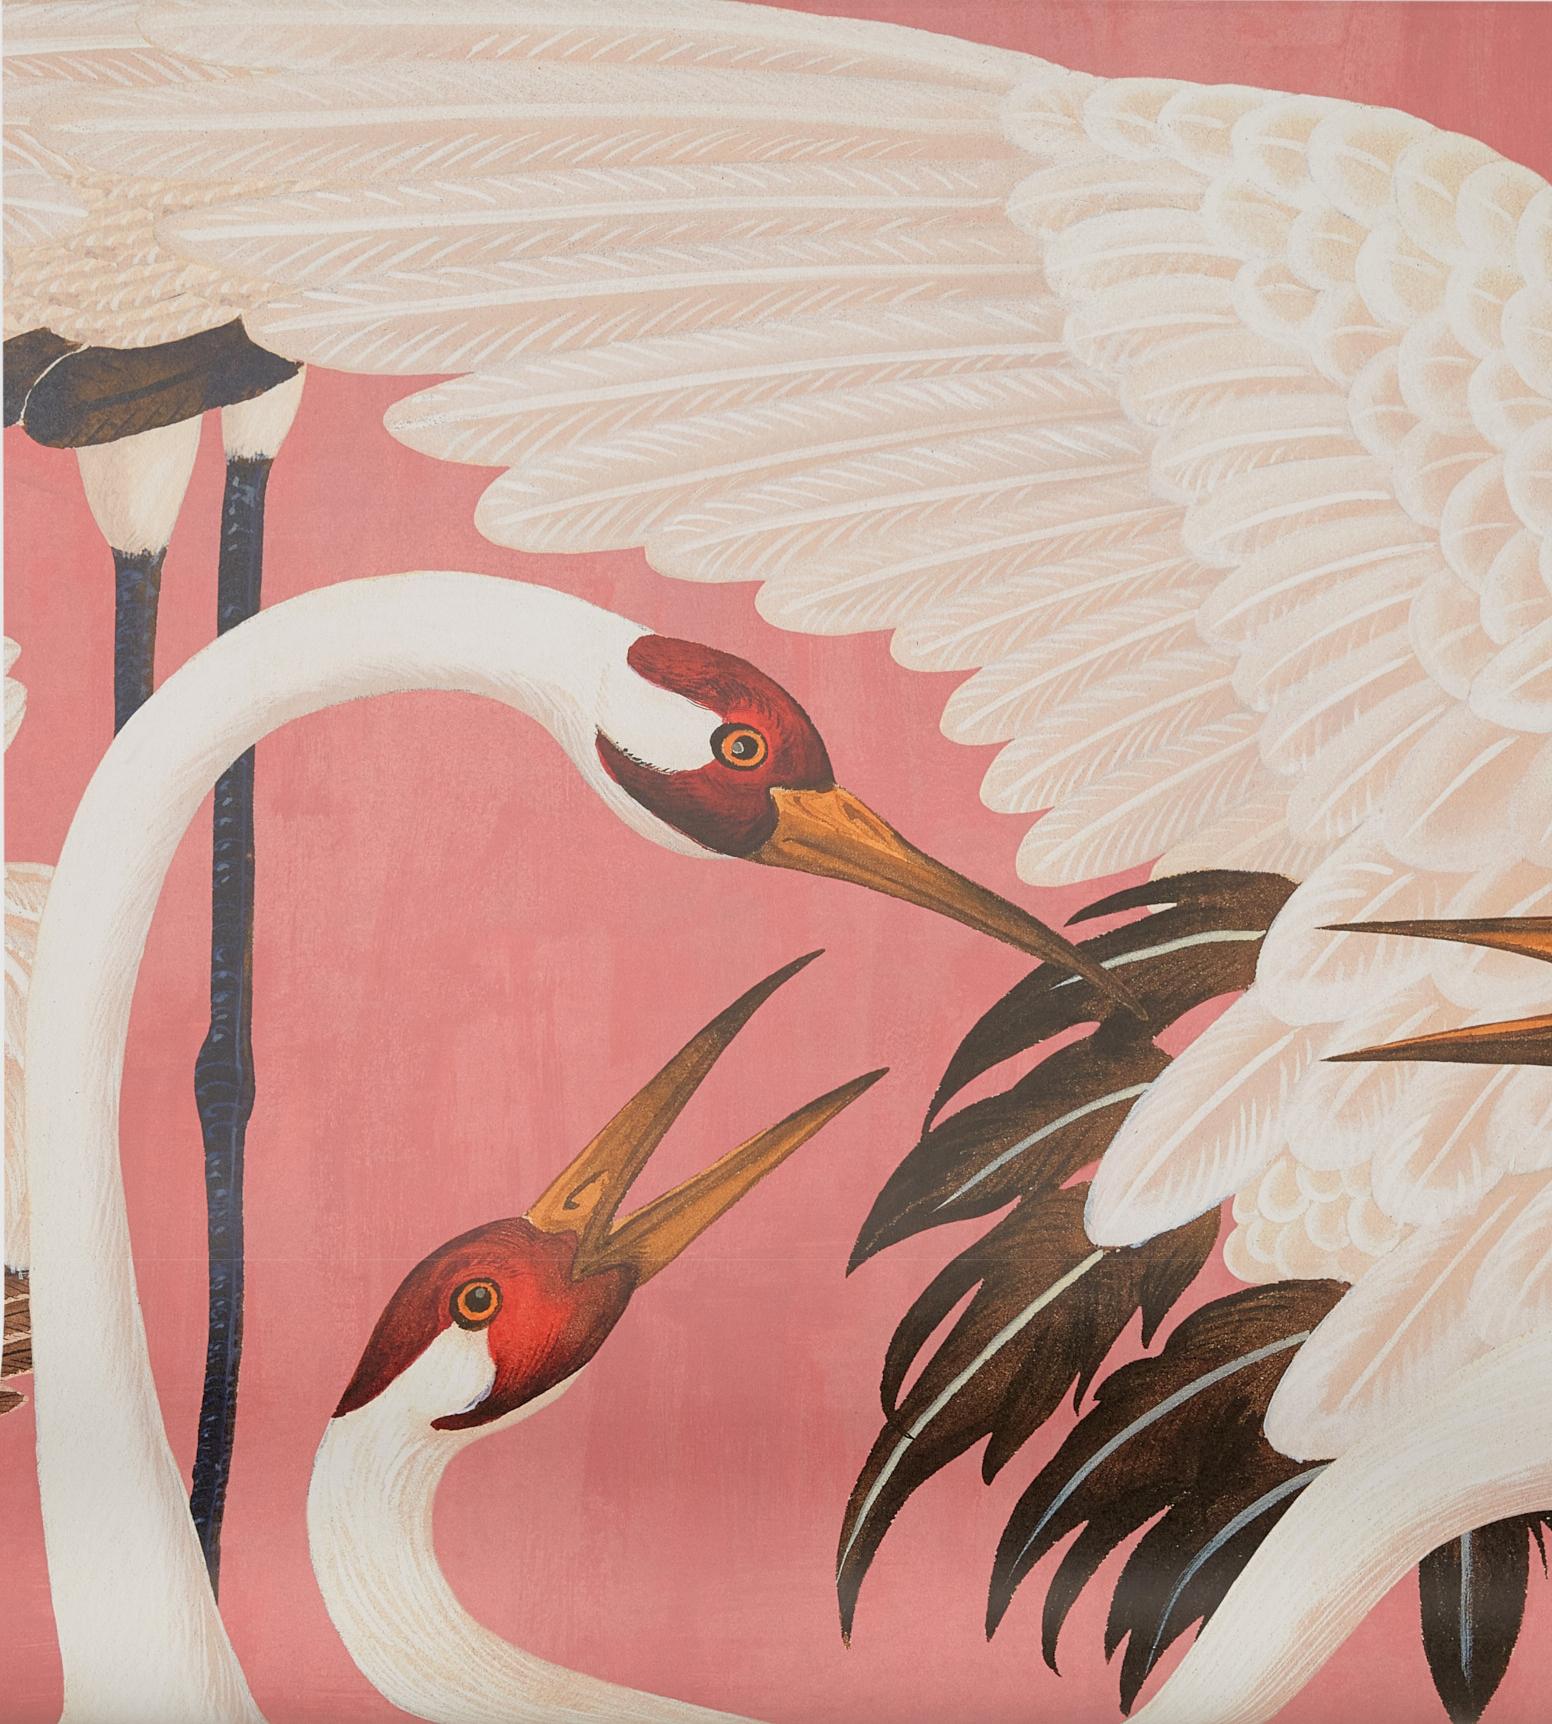 Heron-print-wallpaper 2.jpg